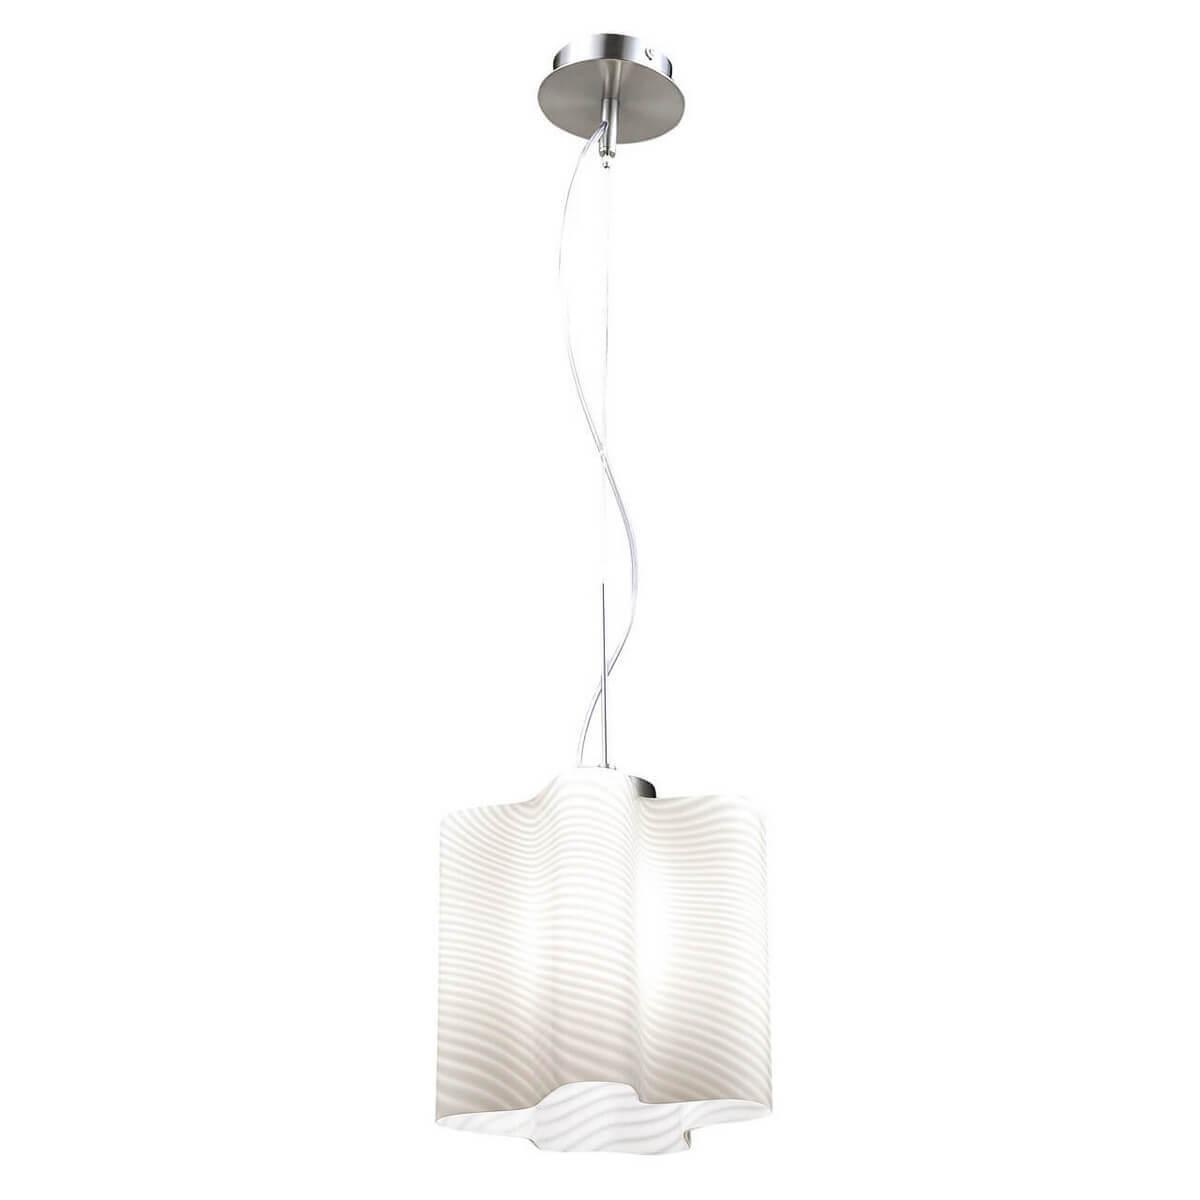 Подвесной светильник Lightstar Nubi Ondoso 802111 lightstar 802130 md998 3 подвес nubi 3х40w e27 хром белый шт